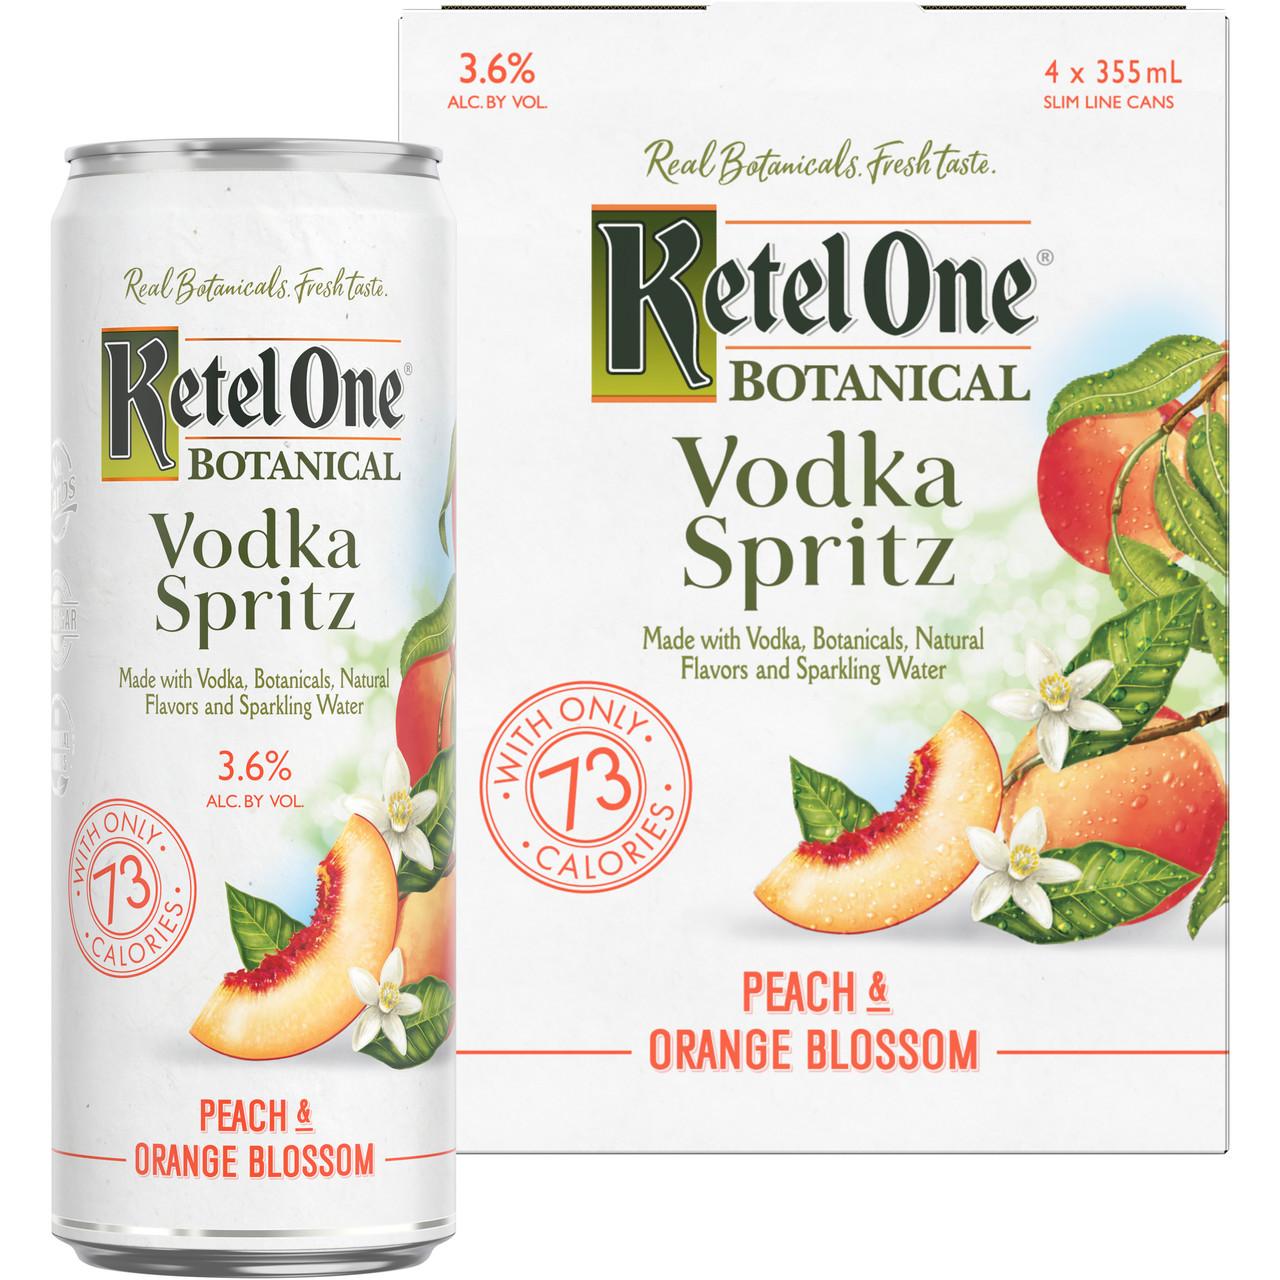 Ketel One Botanical Peach & Orange Blossom Vodka Spritz - 4pk 355ml Cans